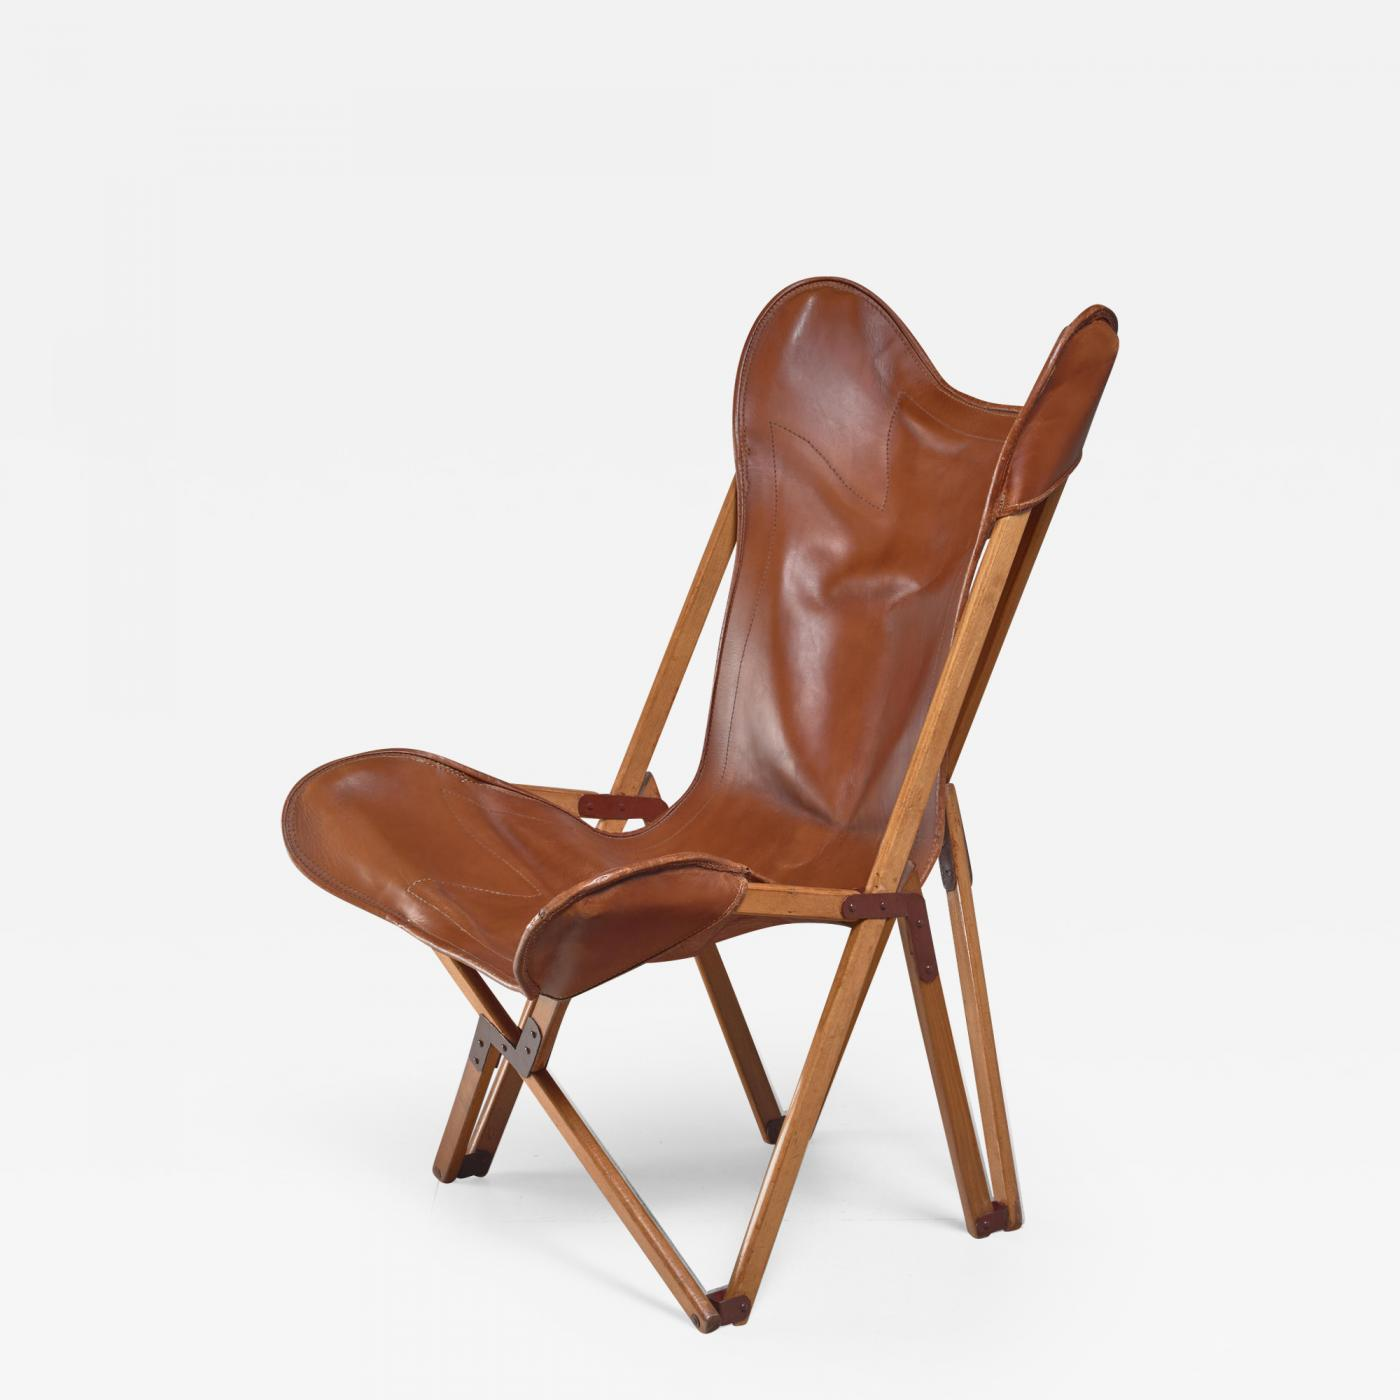 Groovy Joseph Beverley Fenby Tripolina Folding Chair Italy 1930S Evergreenethics Interior Chair Design Evergreenethicsorg